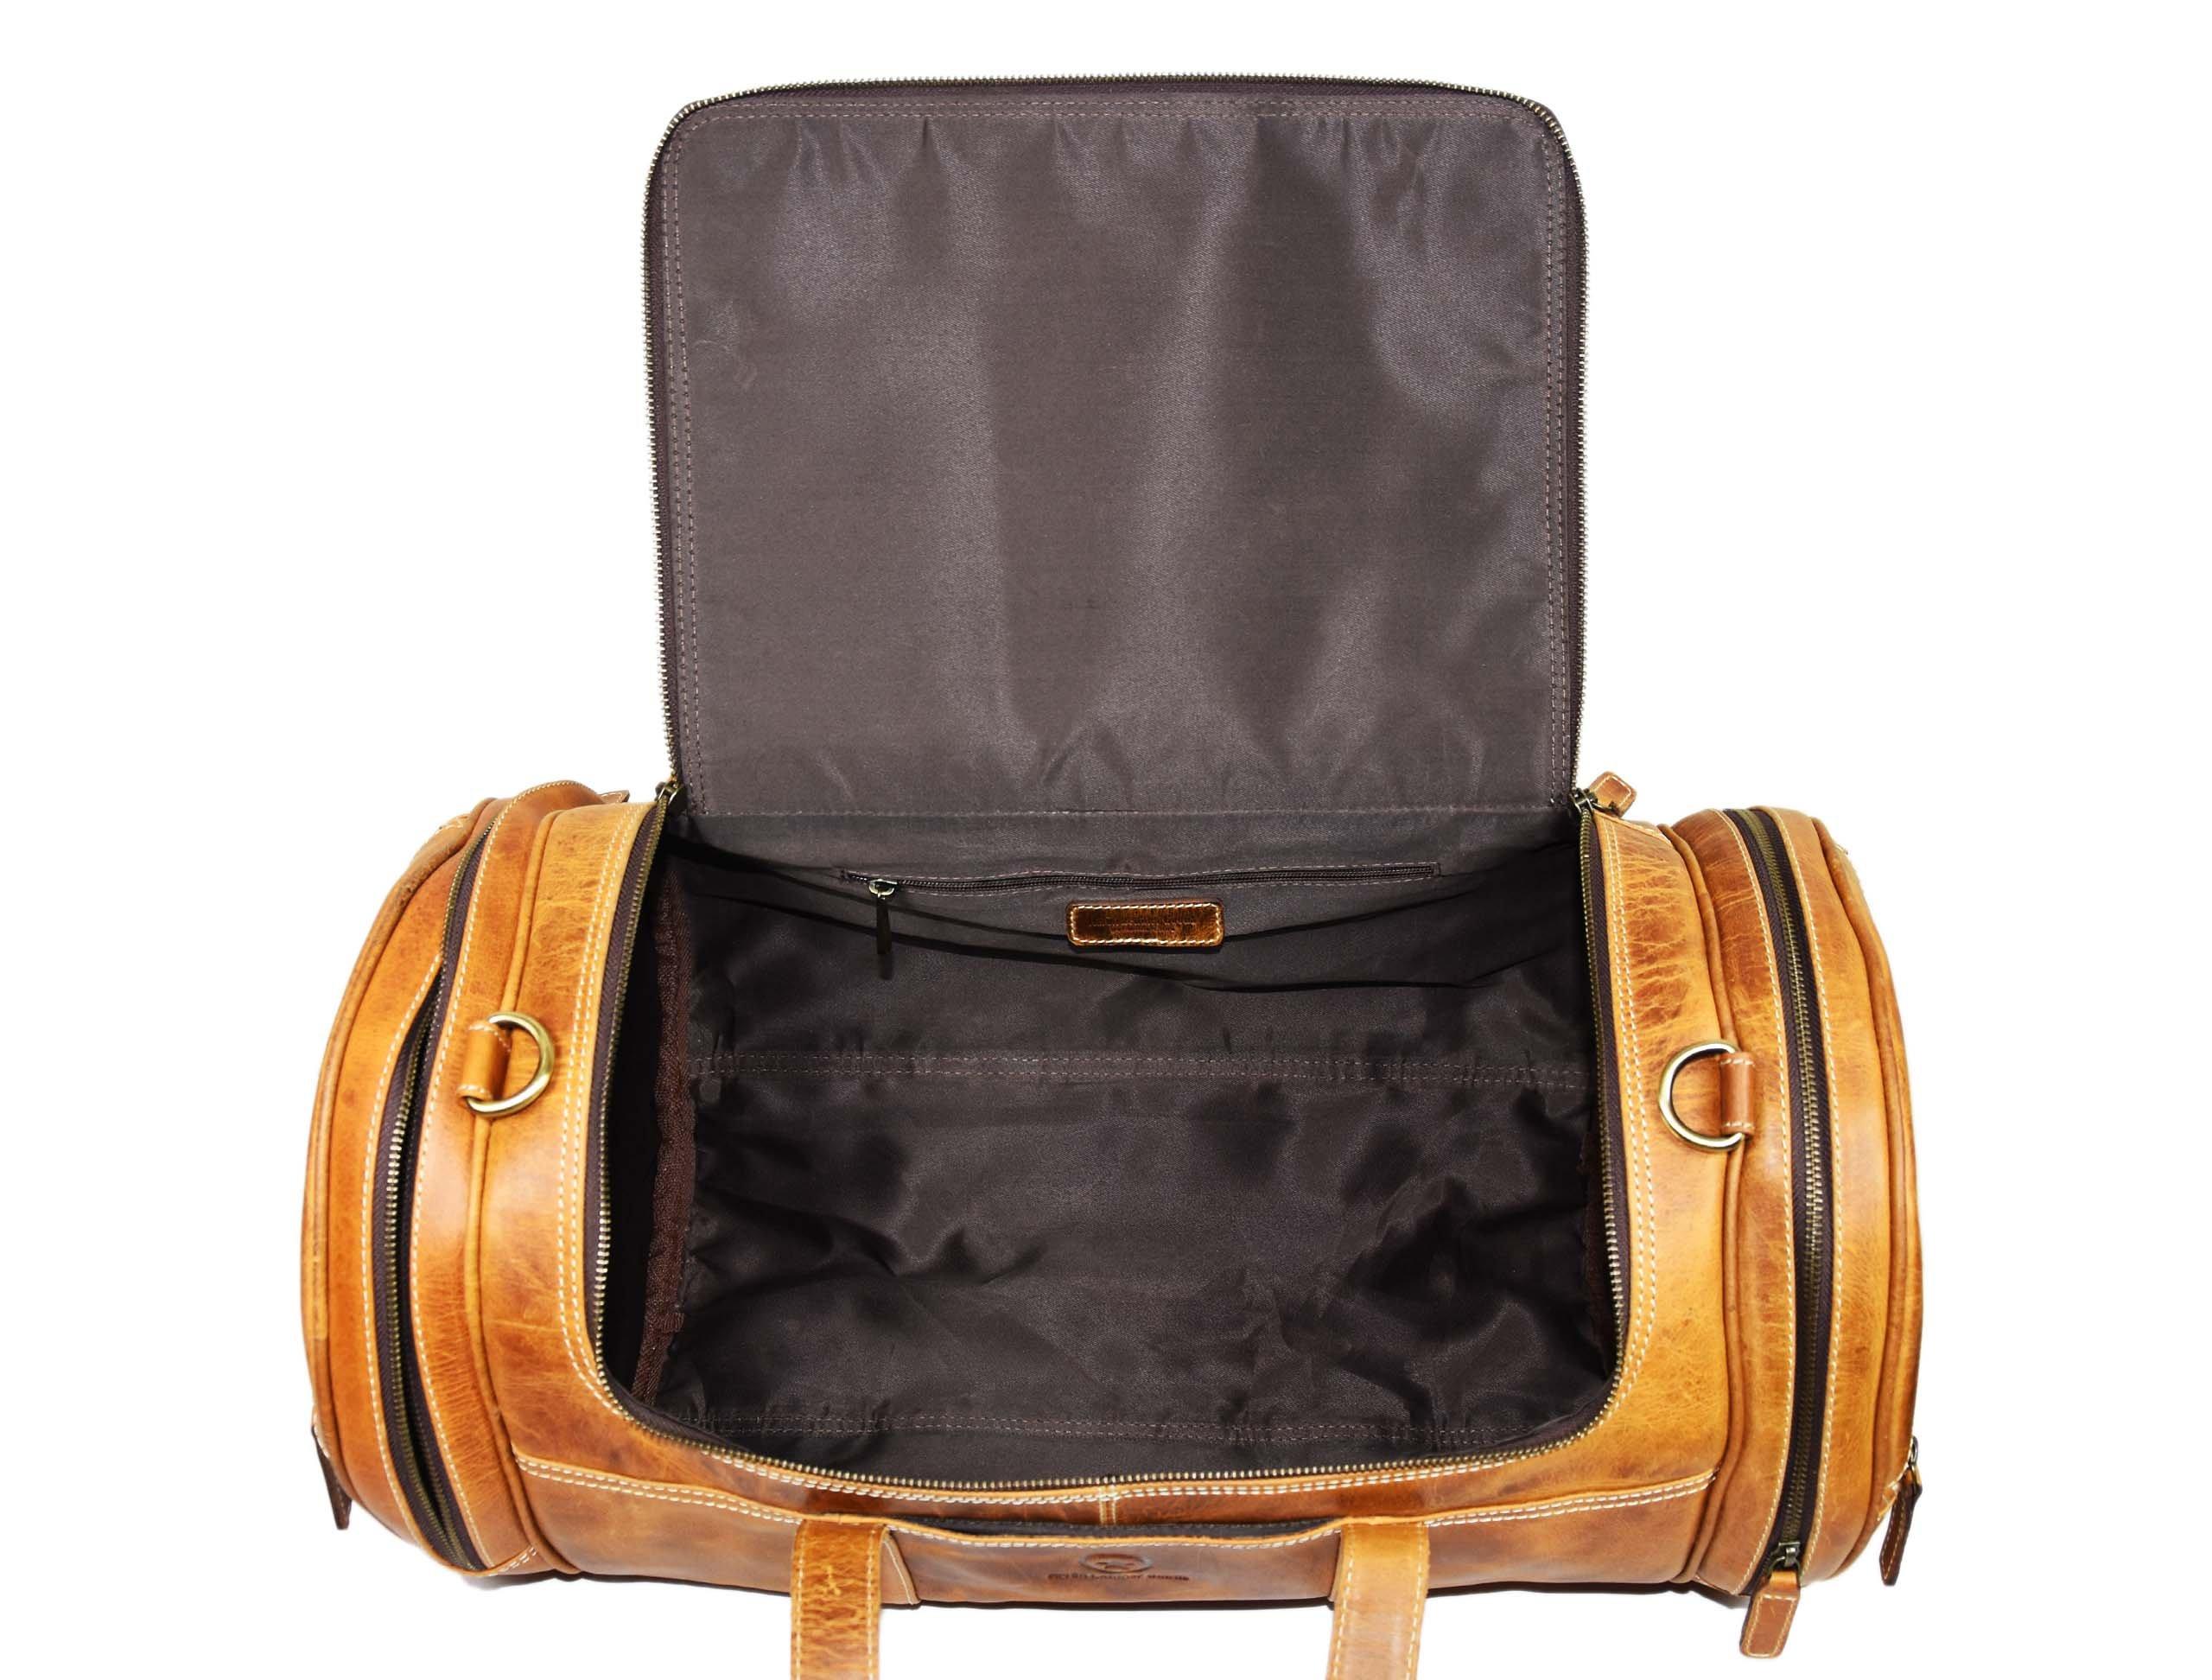 Travel Duffel Overnight Barrel Weekend Leather Bag by Aaron Leather (Brown) by Aaron Leather (Image #4)